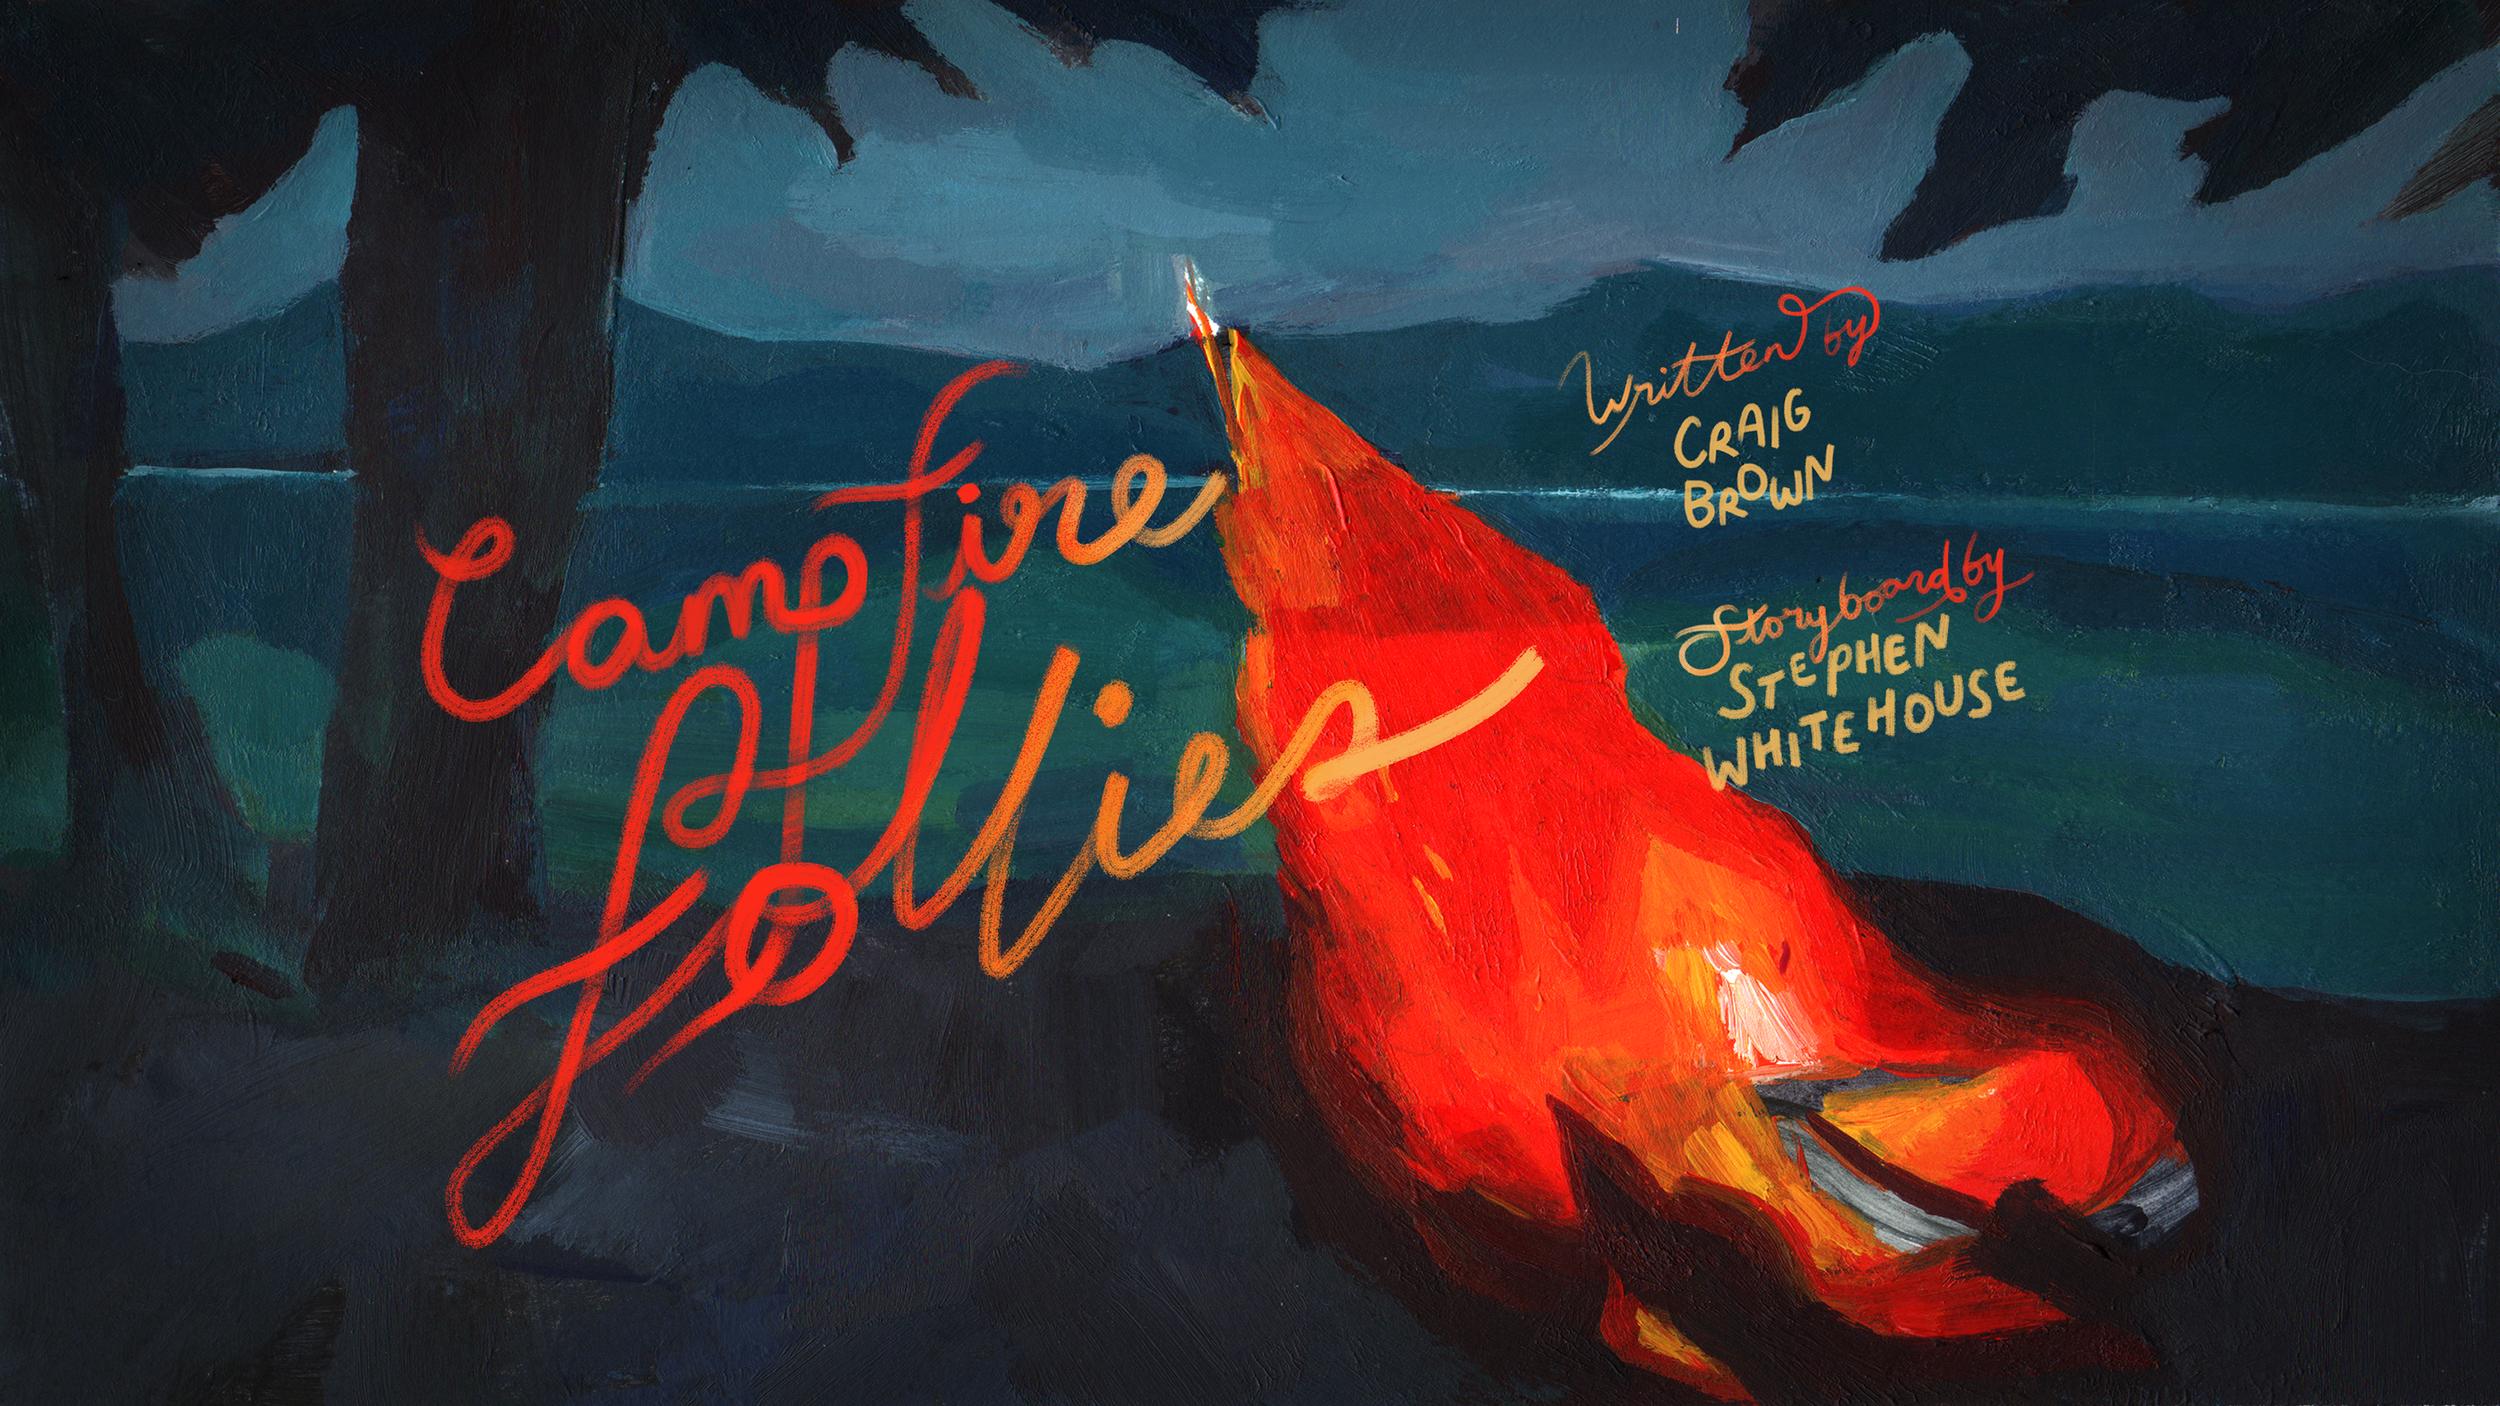 azjin_campfire